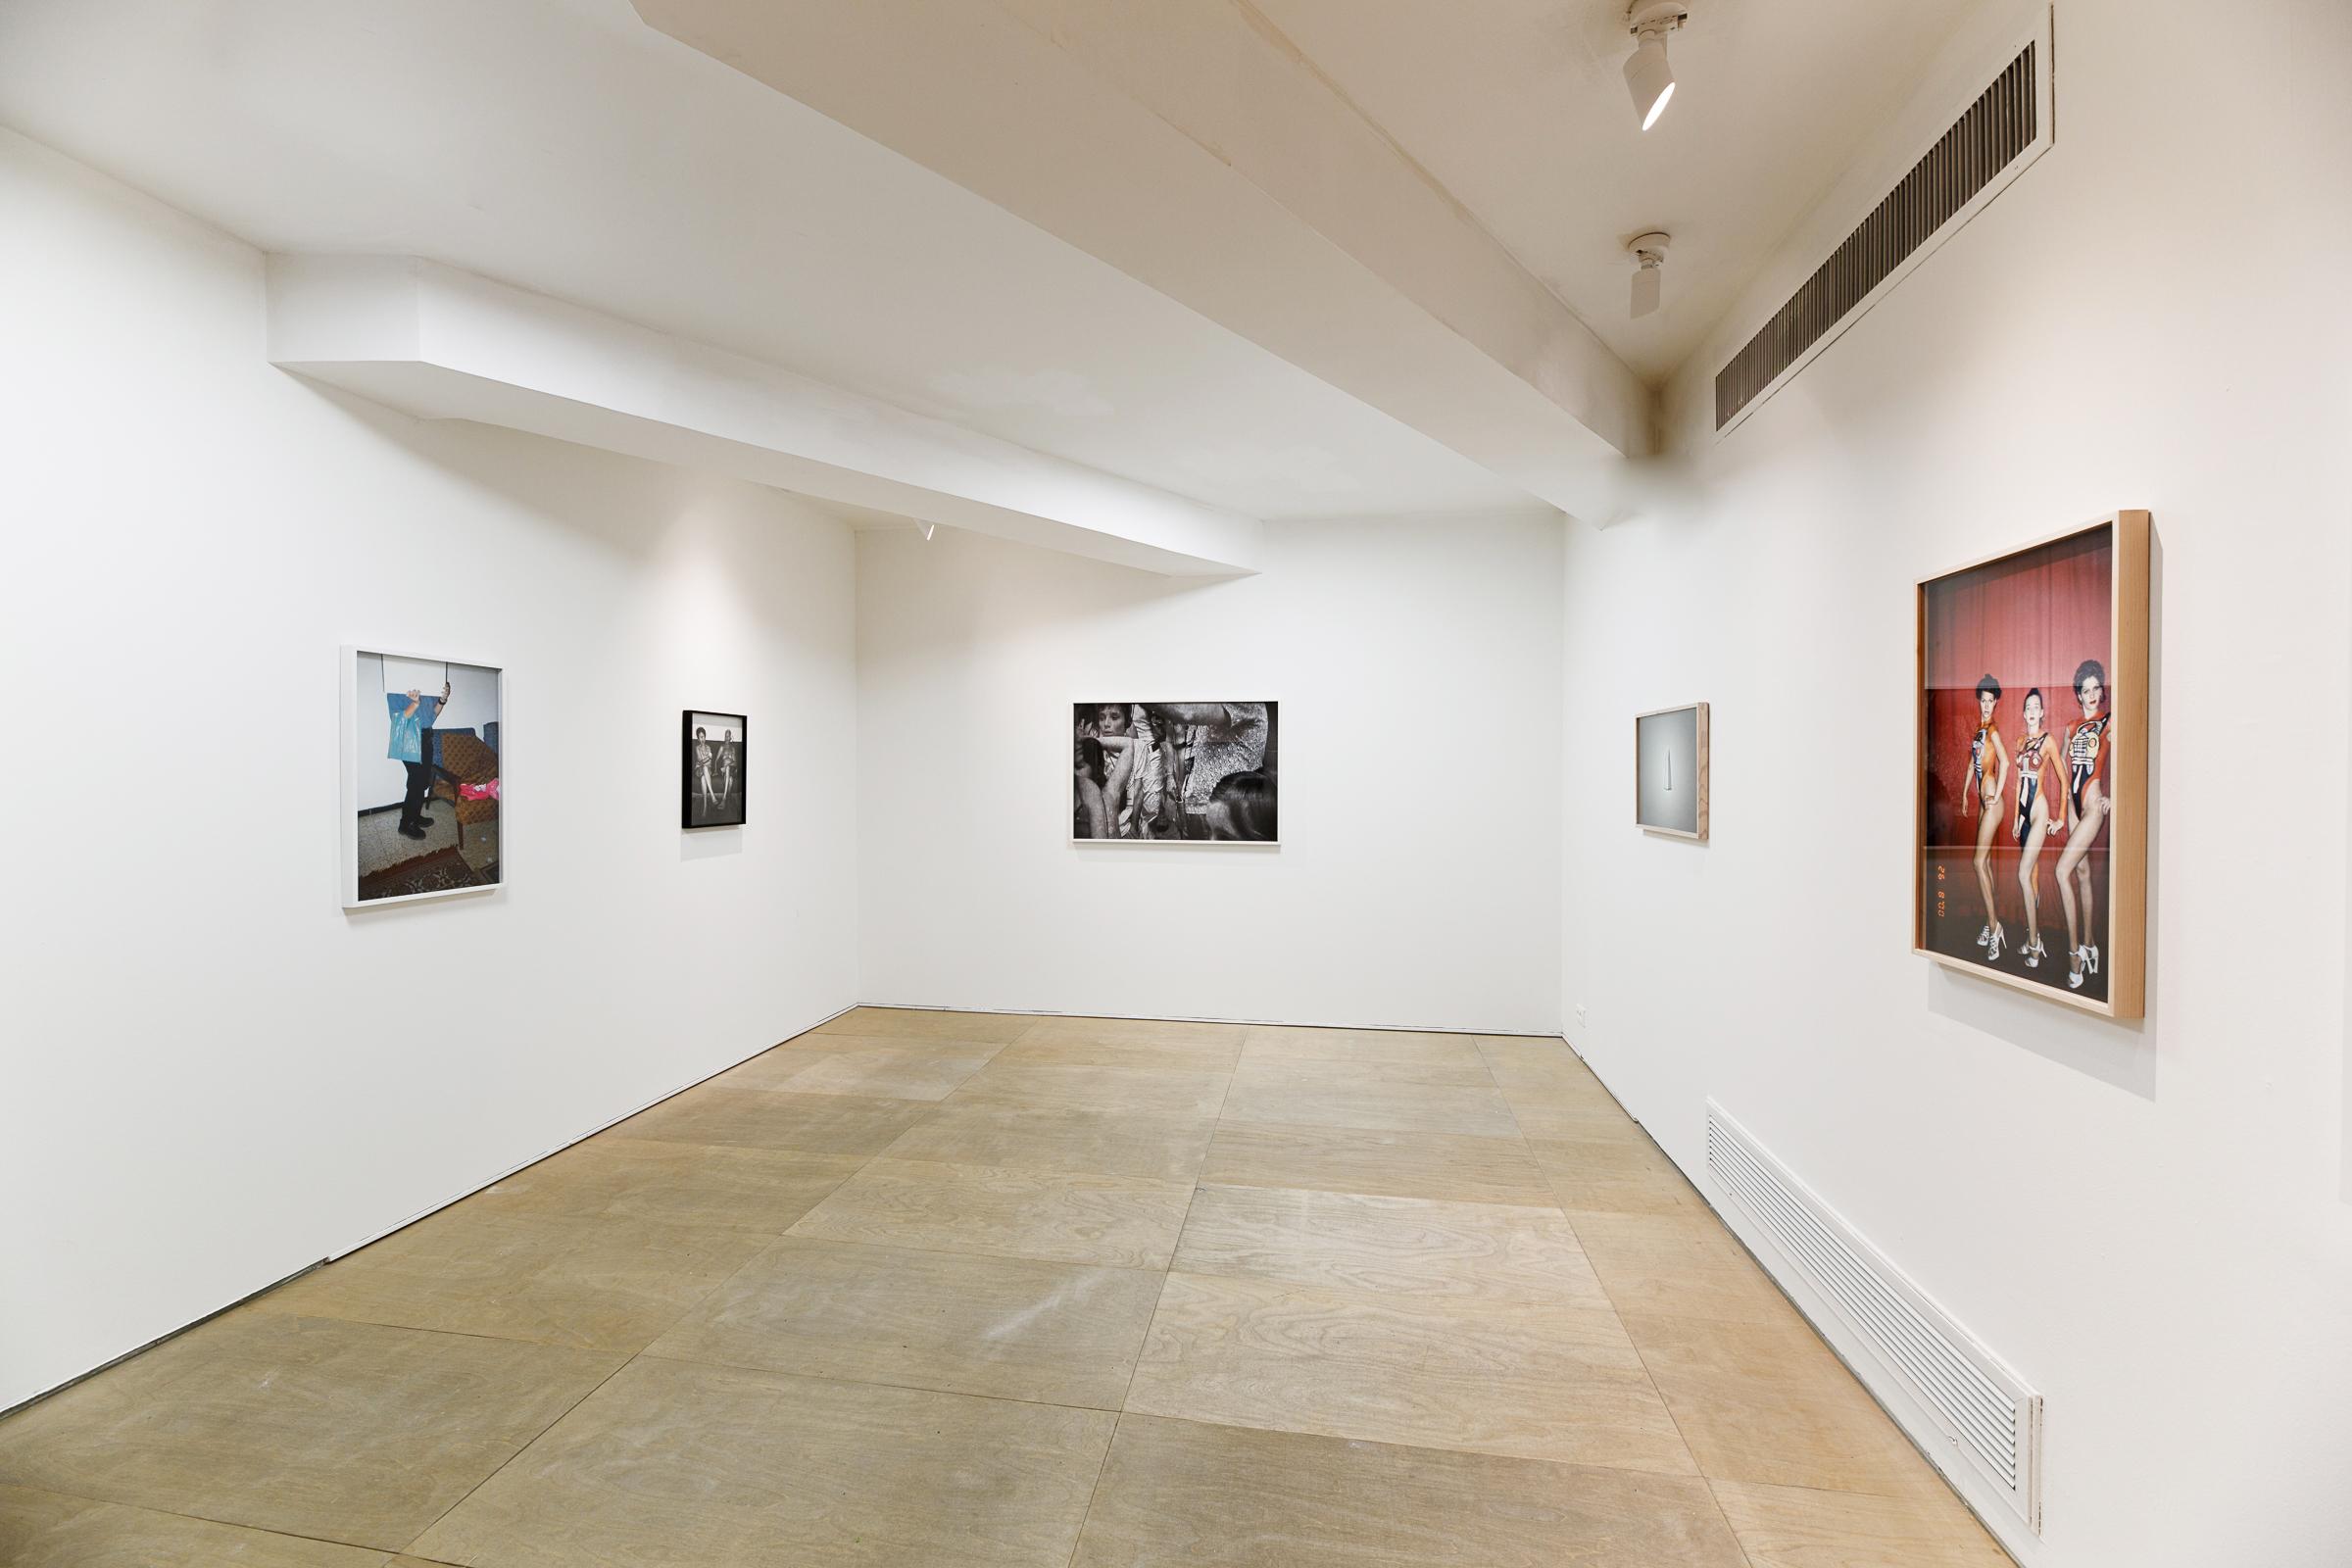 Anna Yam, Olympus, Installation view, Ashdod Art Museum, 2019. Photo by Dafna Gazit